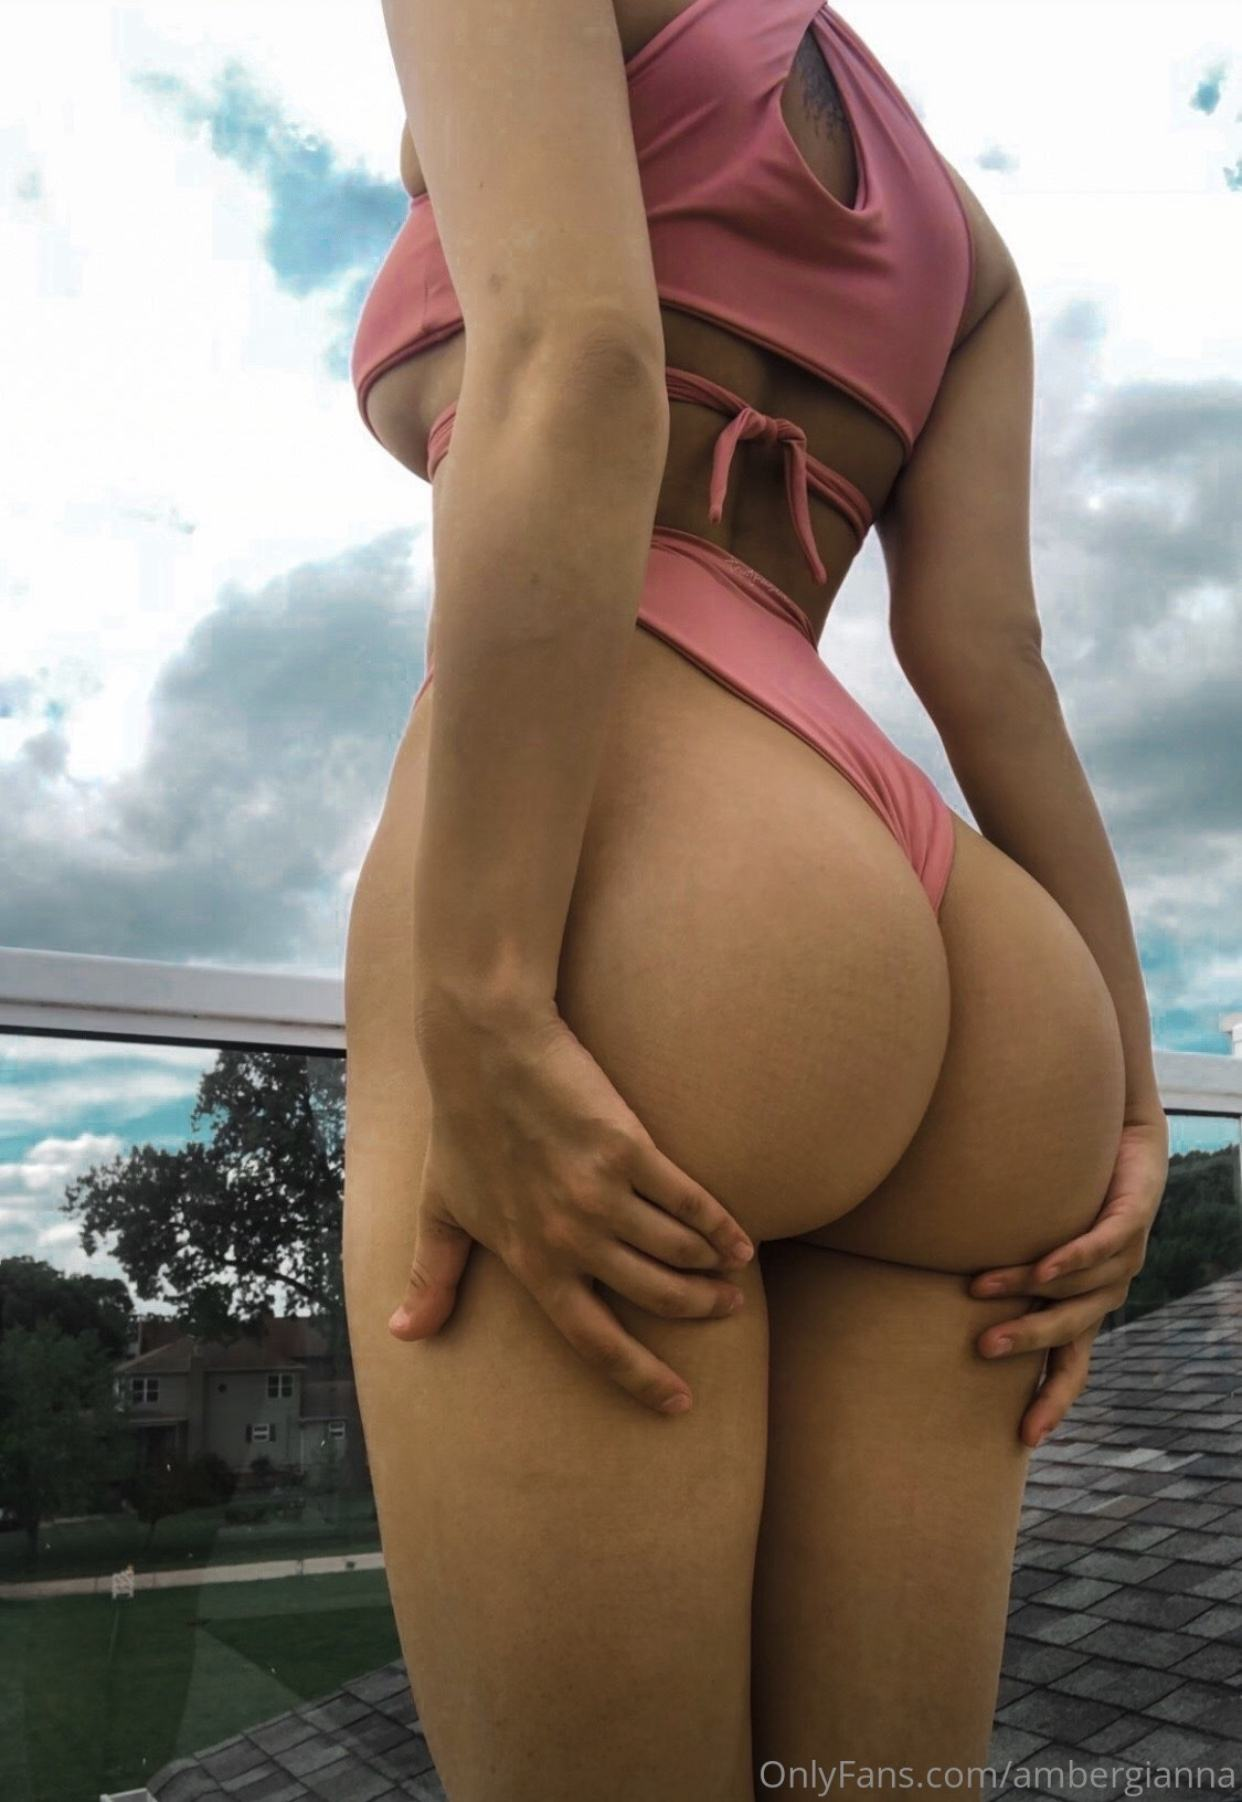 Amber Gianna Leaked 0081